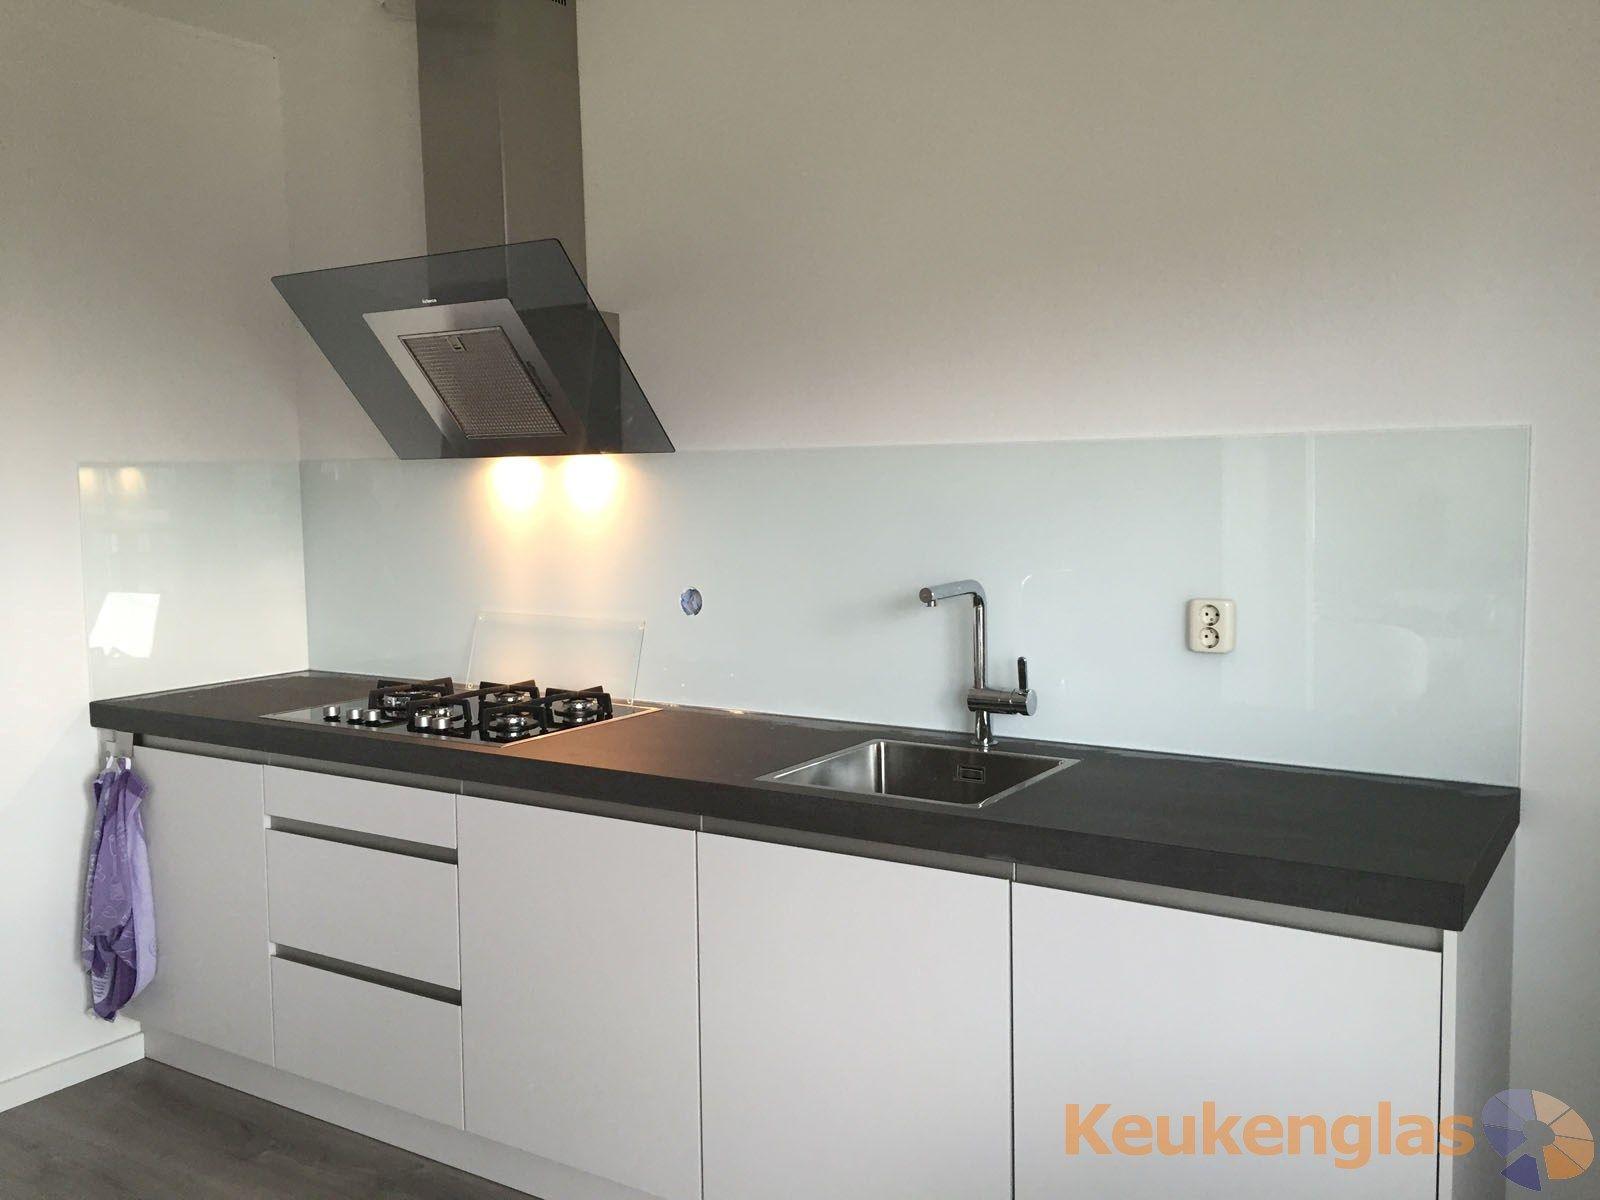 Glaswand Keuken Foto : Witte keukenwand van glas in ede küche splashback